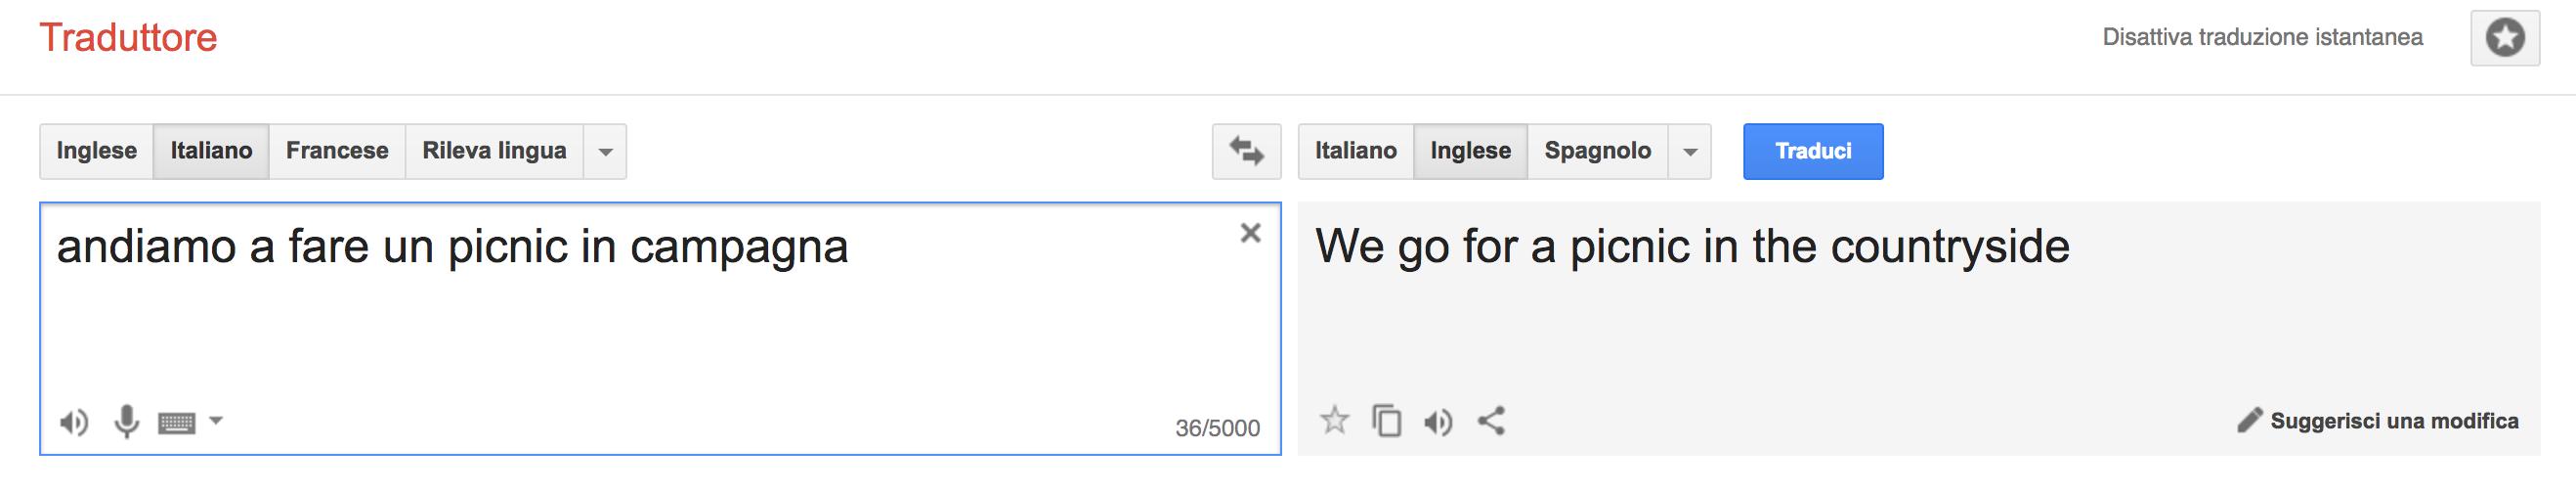 Come funziona Google Translate: riflessioni sulla SEO Copywriting